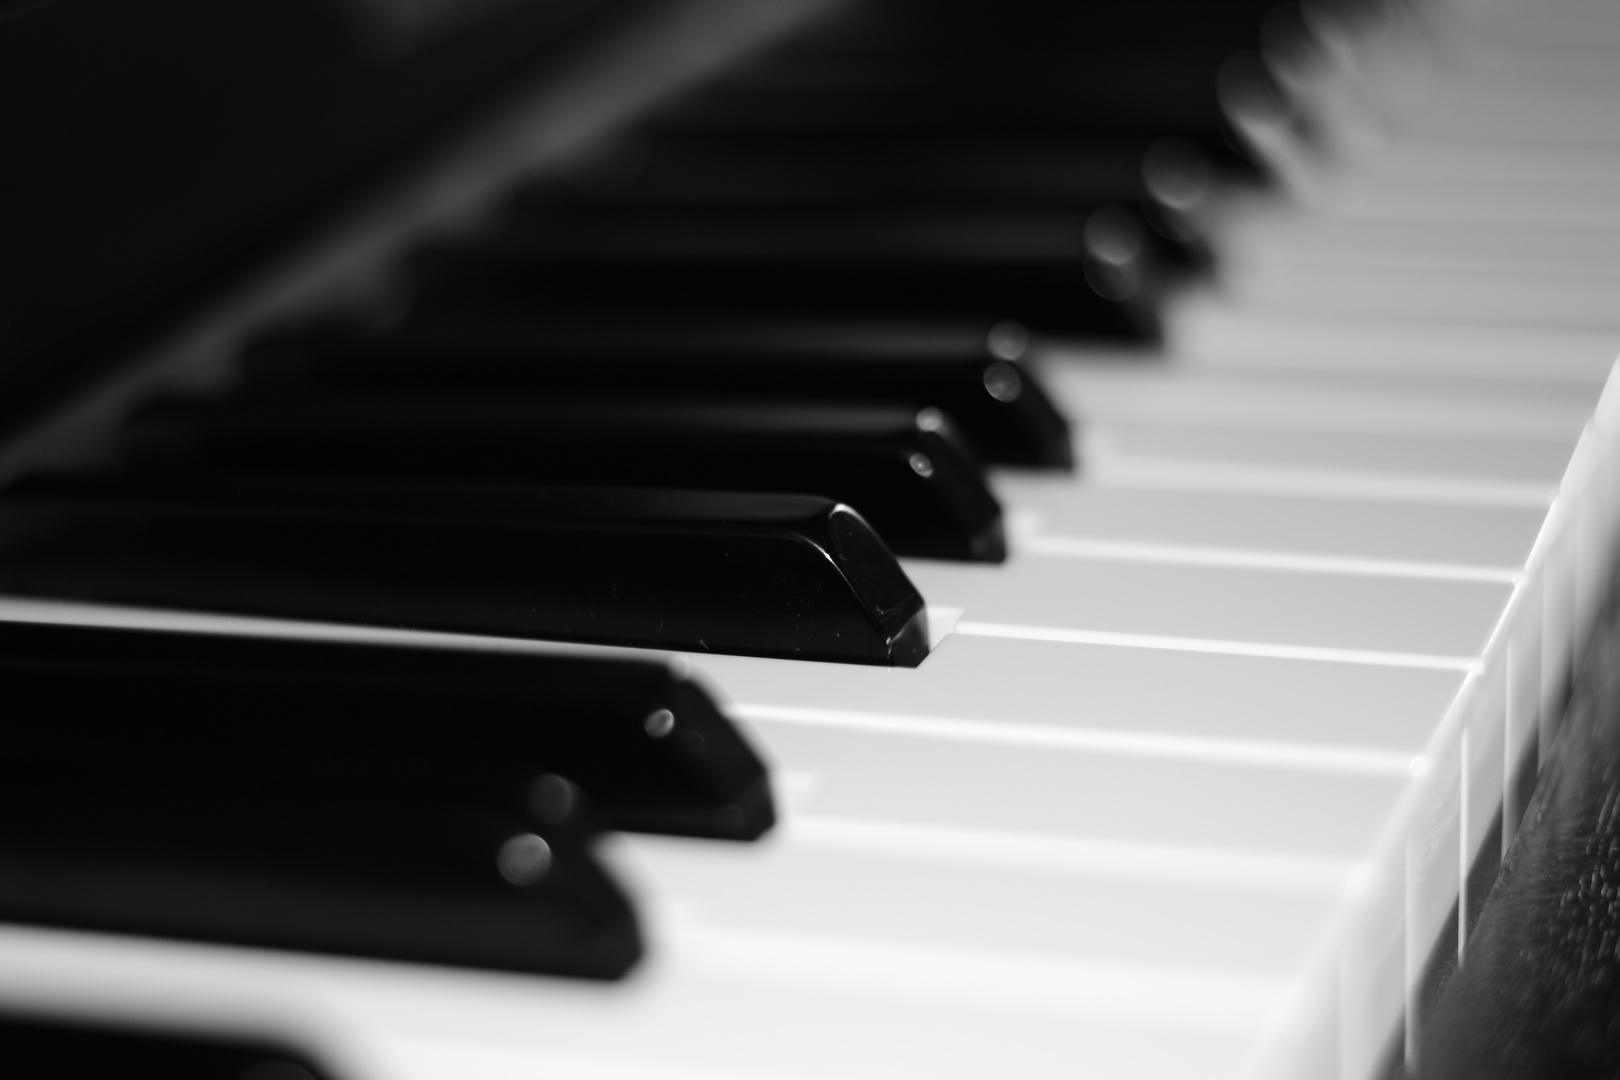 klavier foto bild kunstfotografie kultur musik konzert musikinstrumente bilder auf. Black Bedroom Furniture Sets. Home Design Ideas